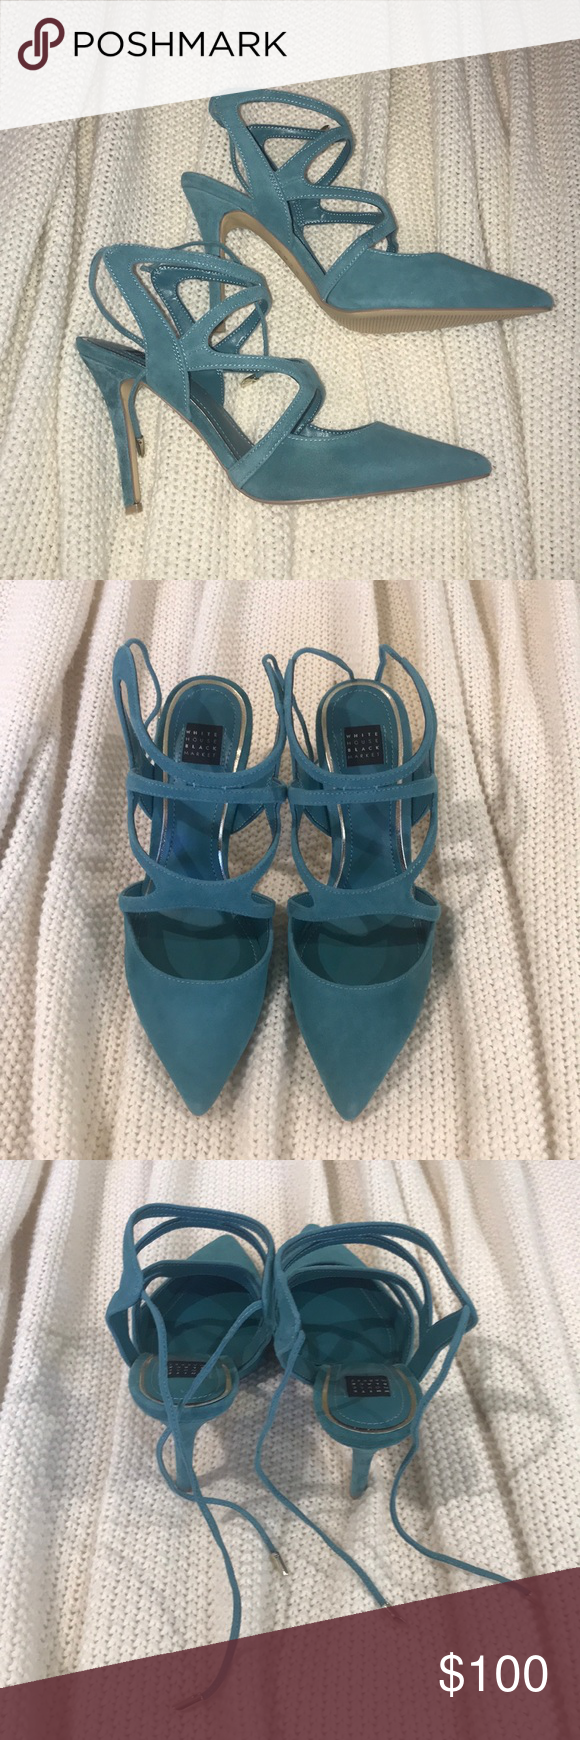 39781fd8641b WHITE HOUSE BLACK MARKET MARLOW HEELS SIZE 7.5 White House Black Market Marlow  Suede strappy heels. Size 7.5. Never worn. White House Black Market Shoes  ...